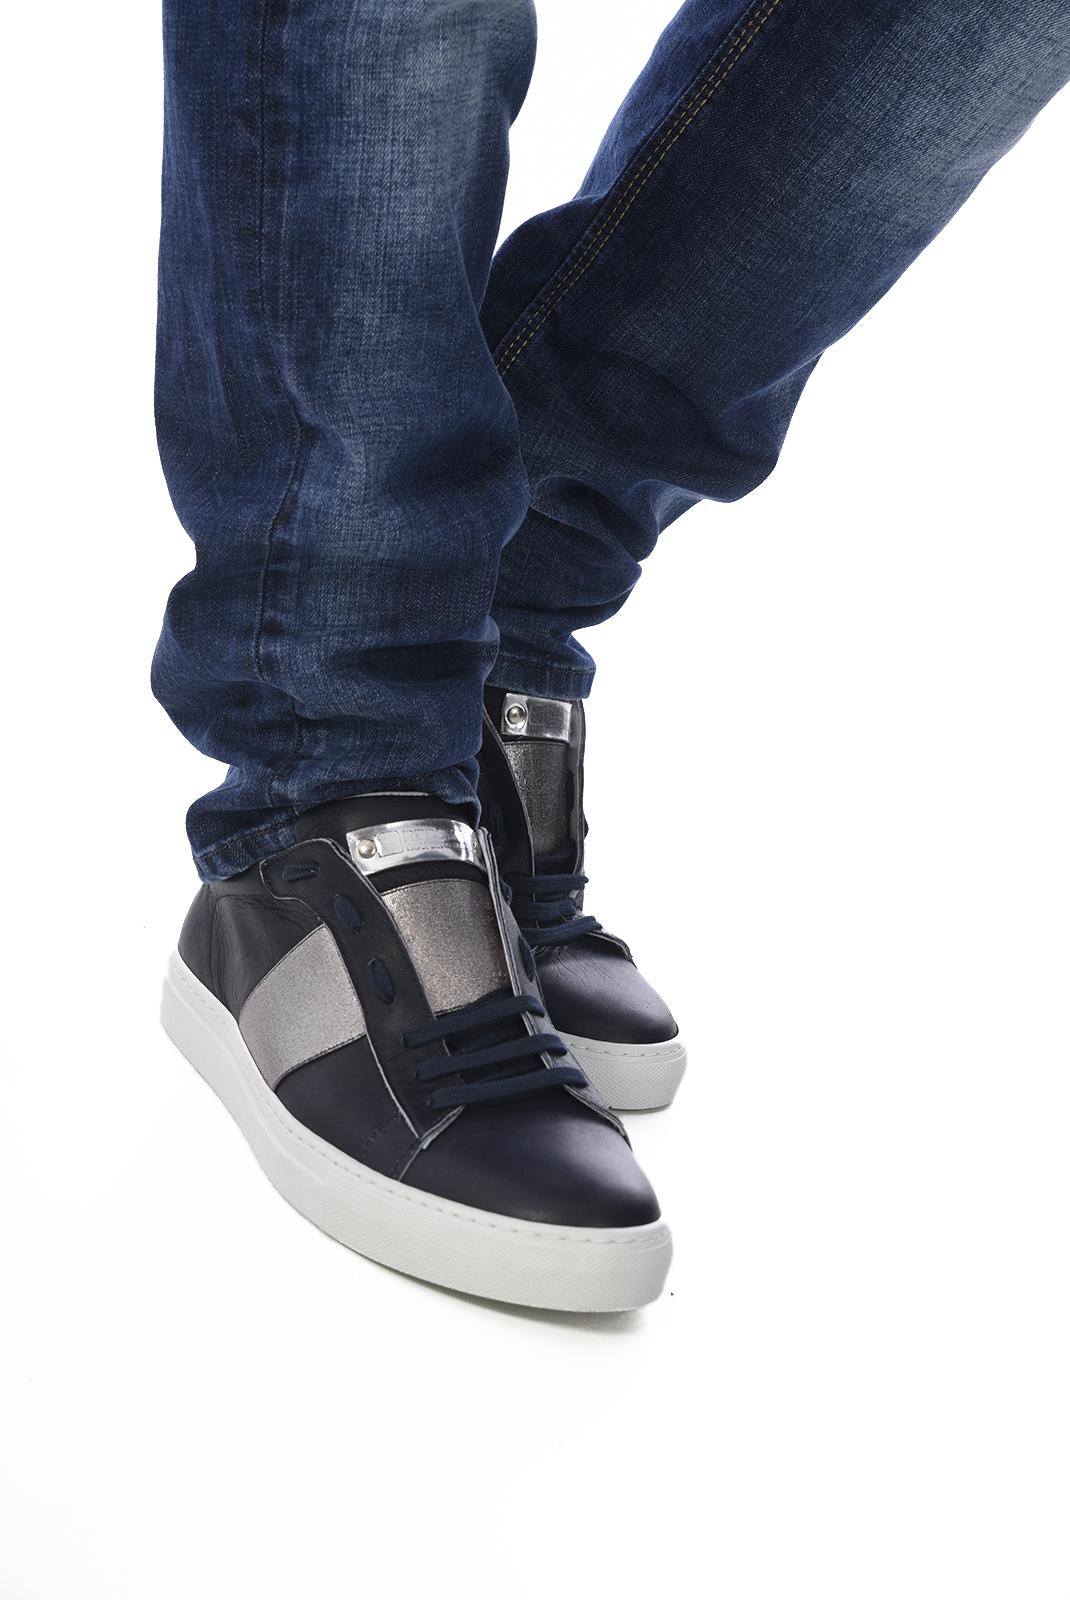 Chaussures   Redskins NIFOSI MARINE ARGENT